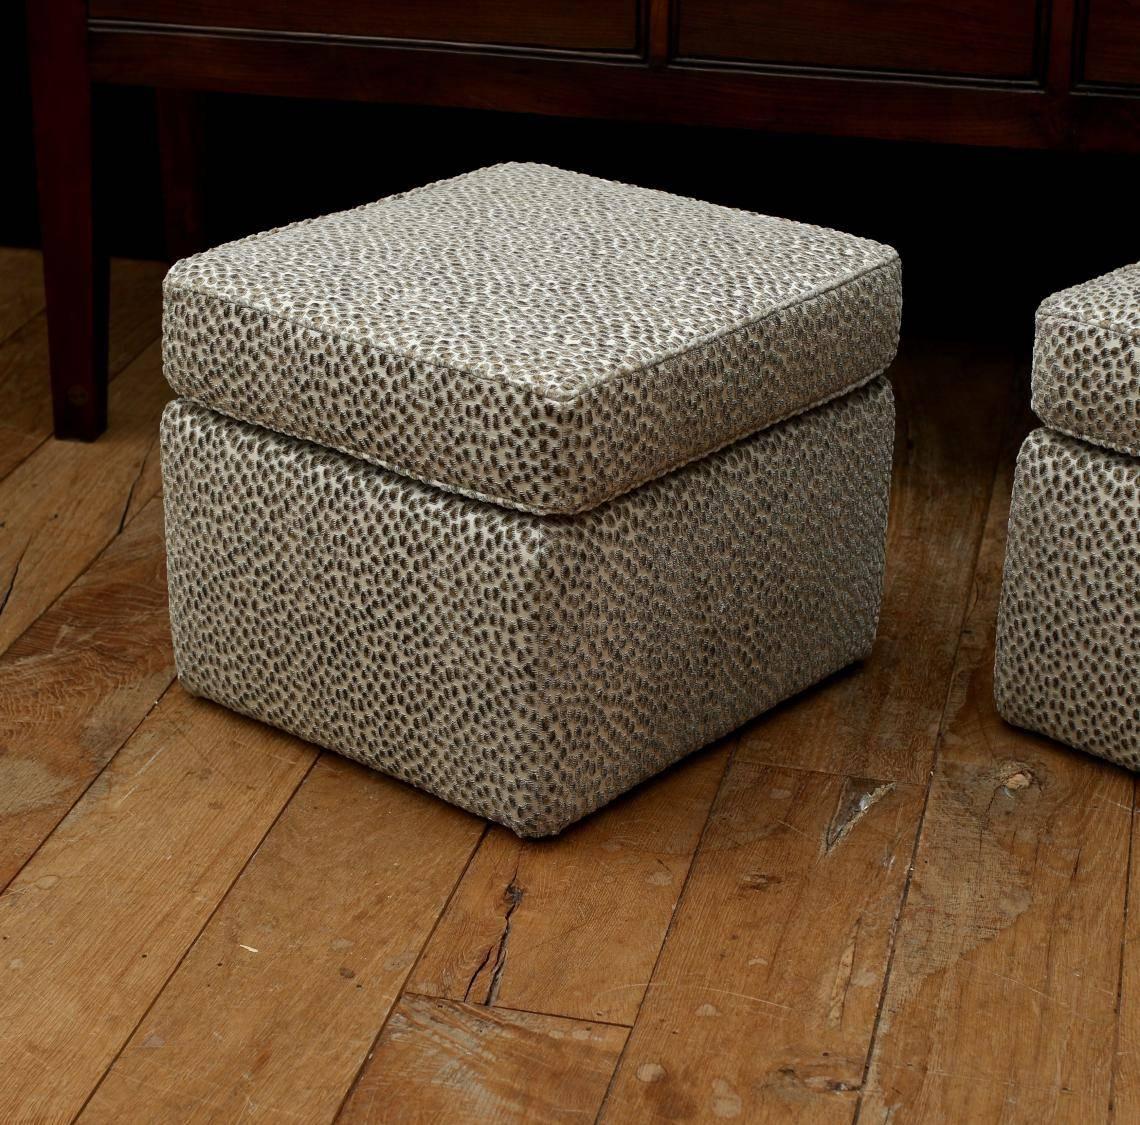 John Stephens | Upholstered Footstools regarding Upholstered Footstools (Image 9 of 30)